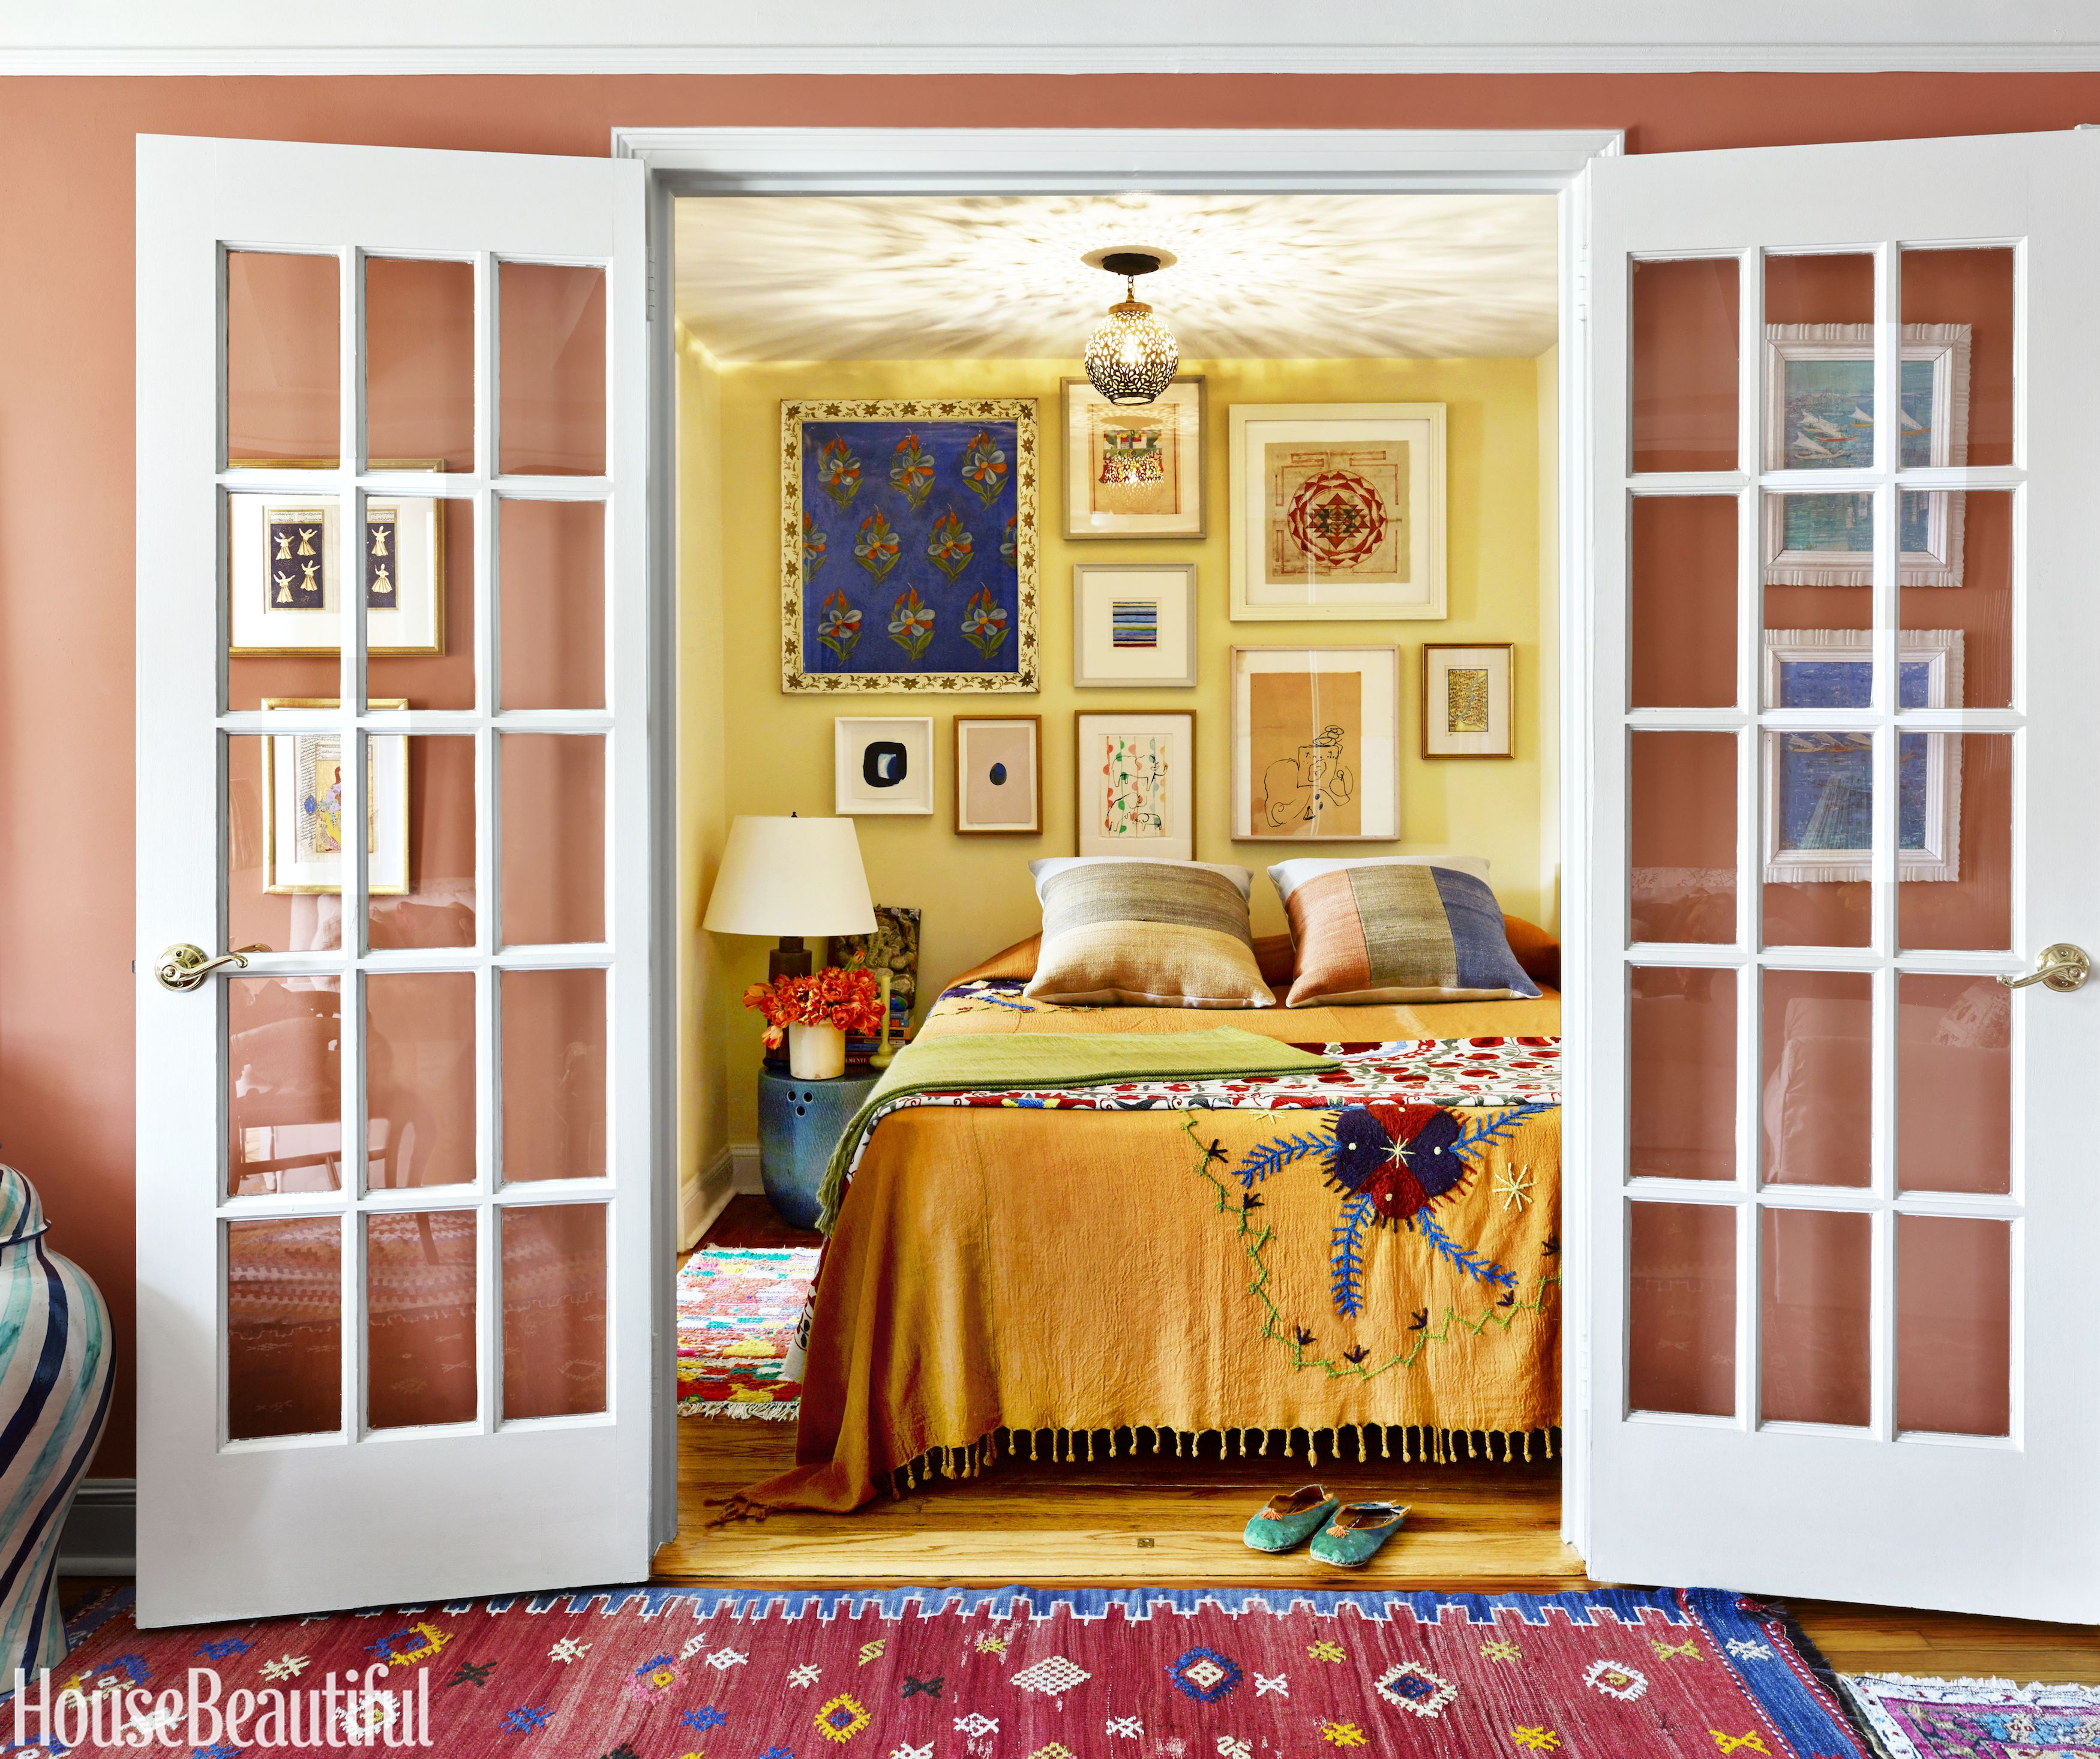 175+ Beautiful Designer Bedrooms to Inspire You | Sunnies, Sunlight ...